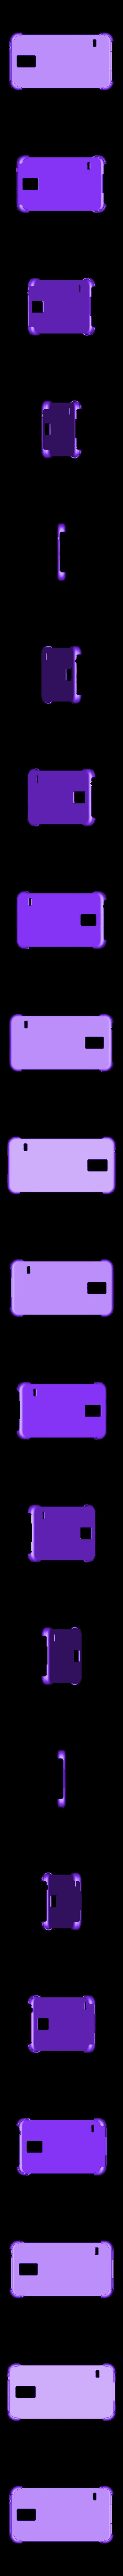 Plain_S5corners.stl Download free STL file Galaxy S5 Hard Case • Design to 3D print, Umqais